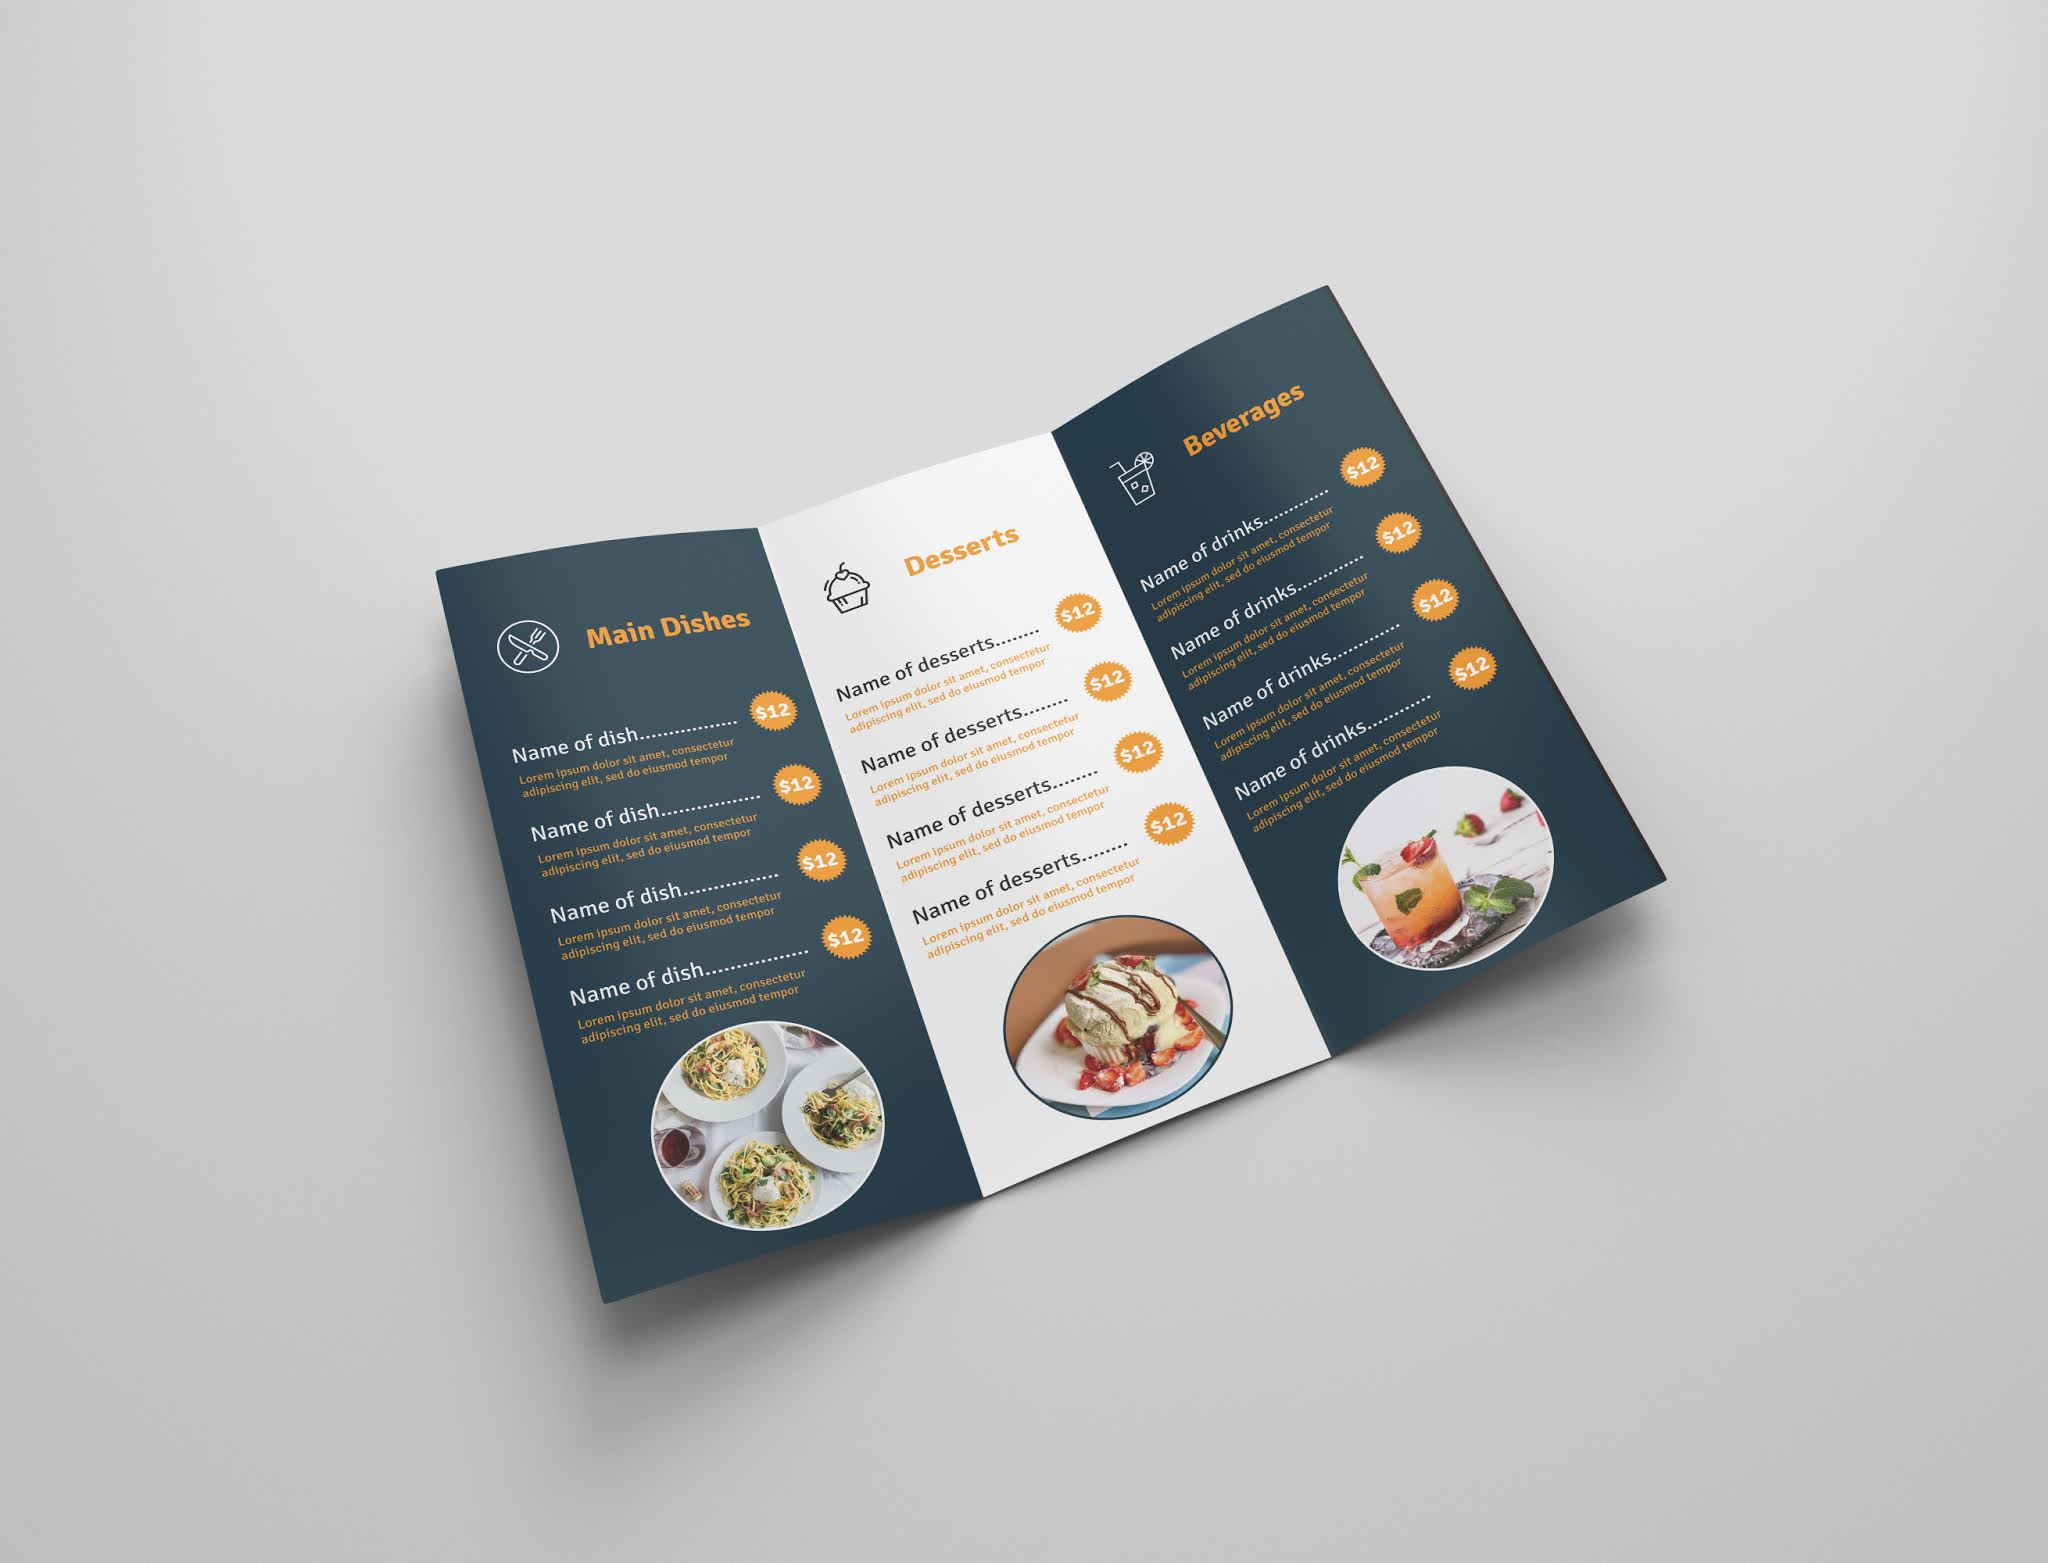 Download a free open source food brochure, free food menu, free download 2